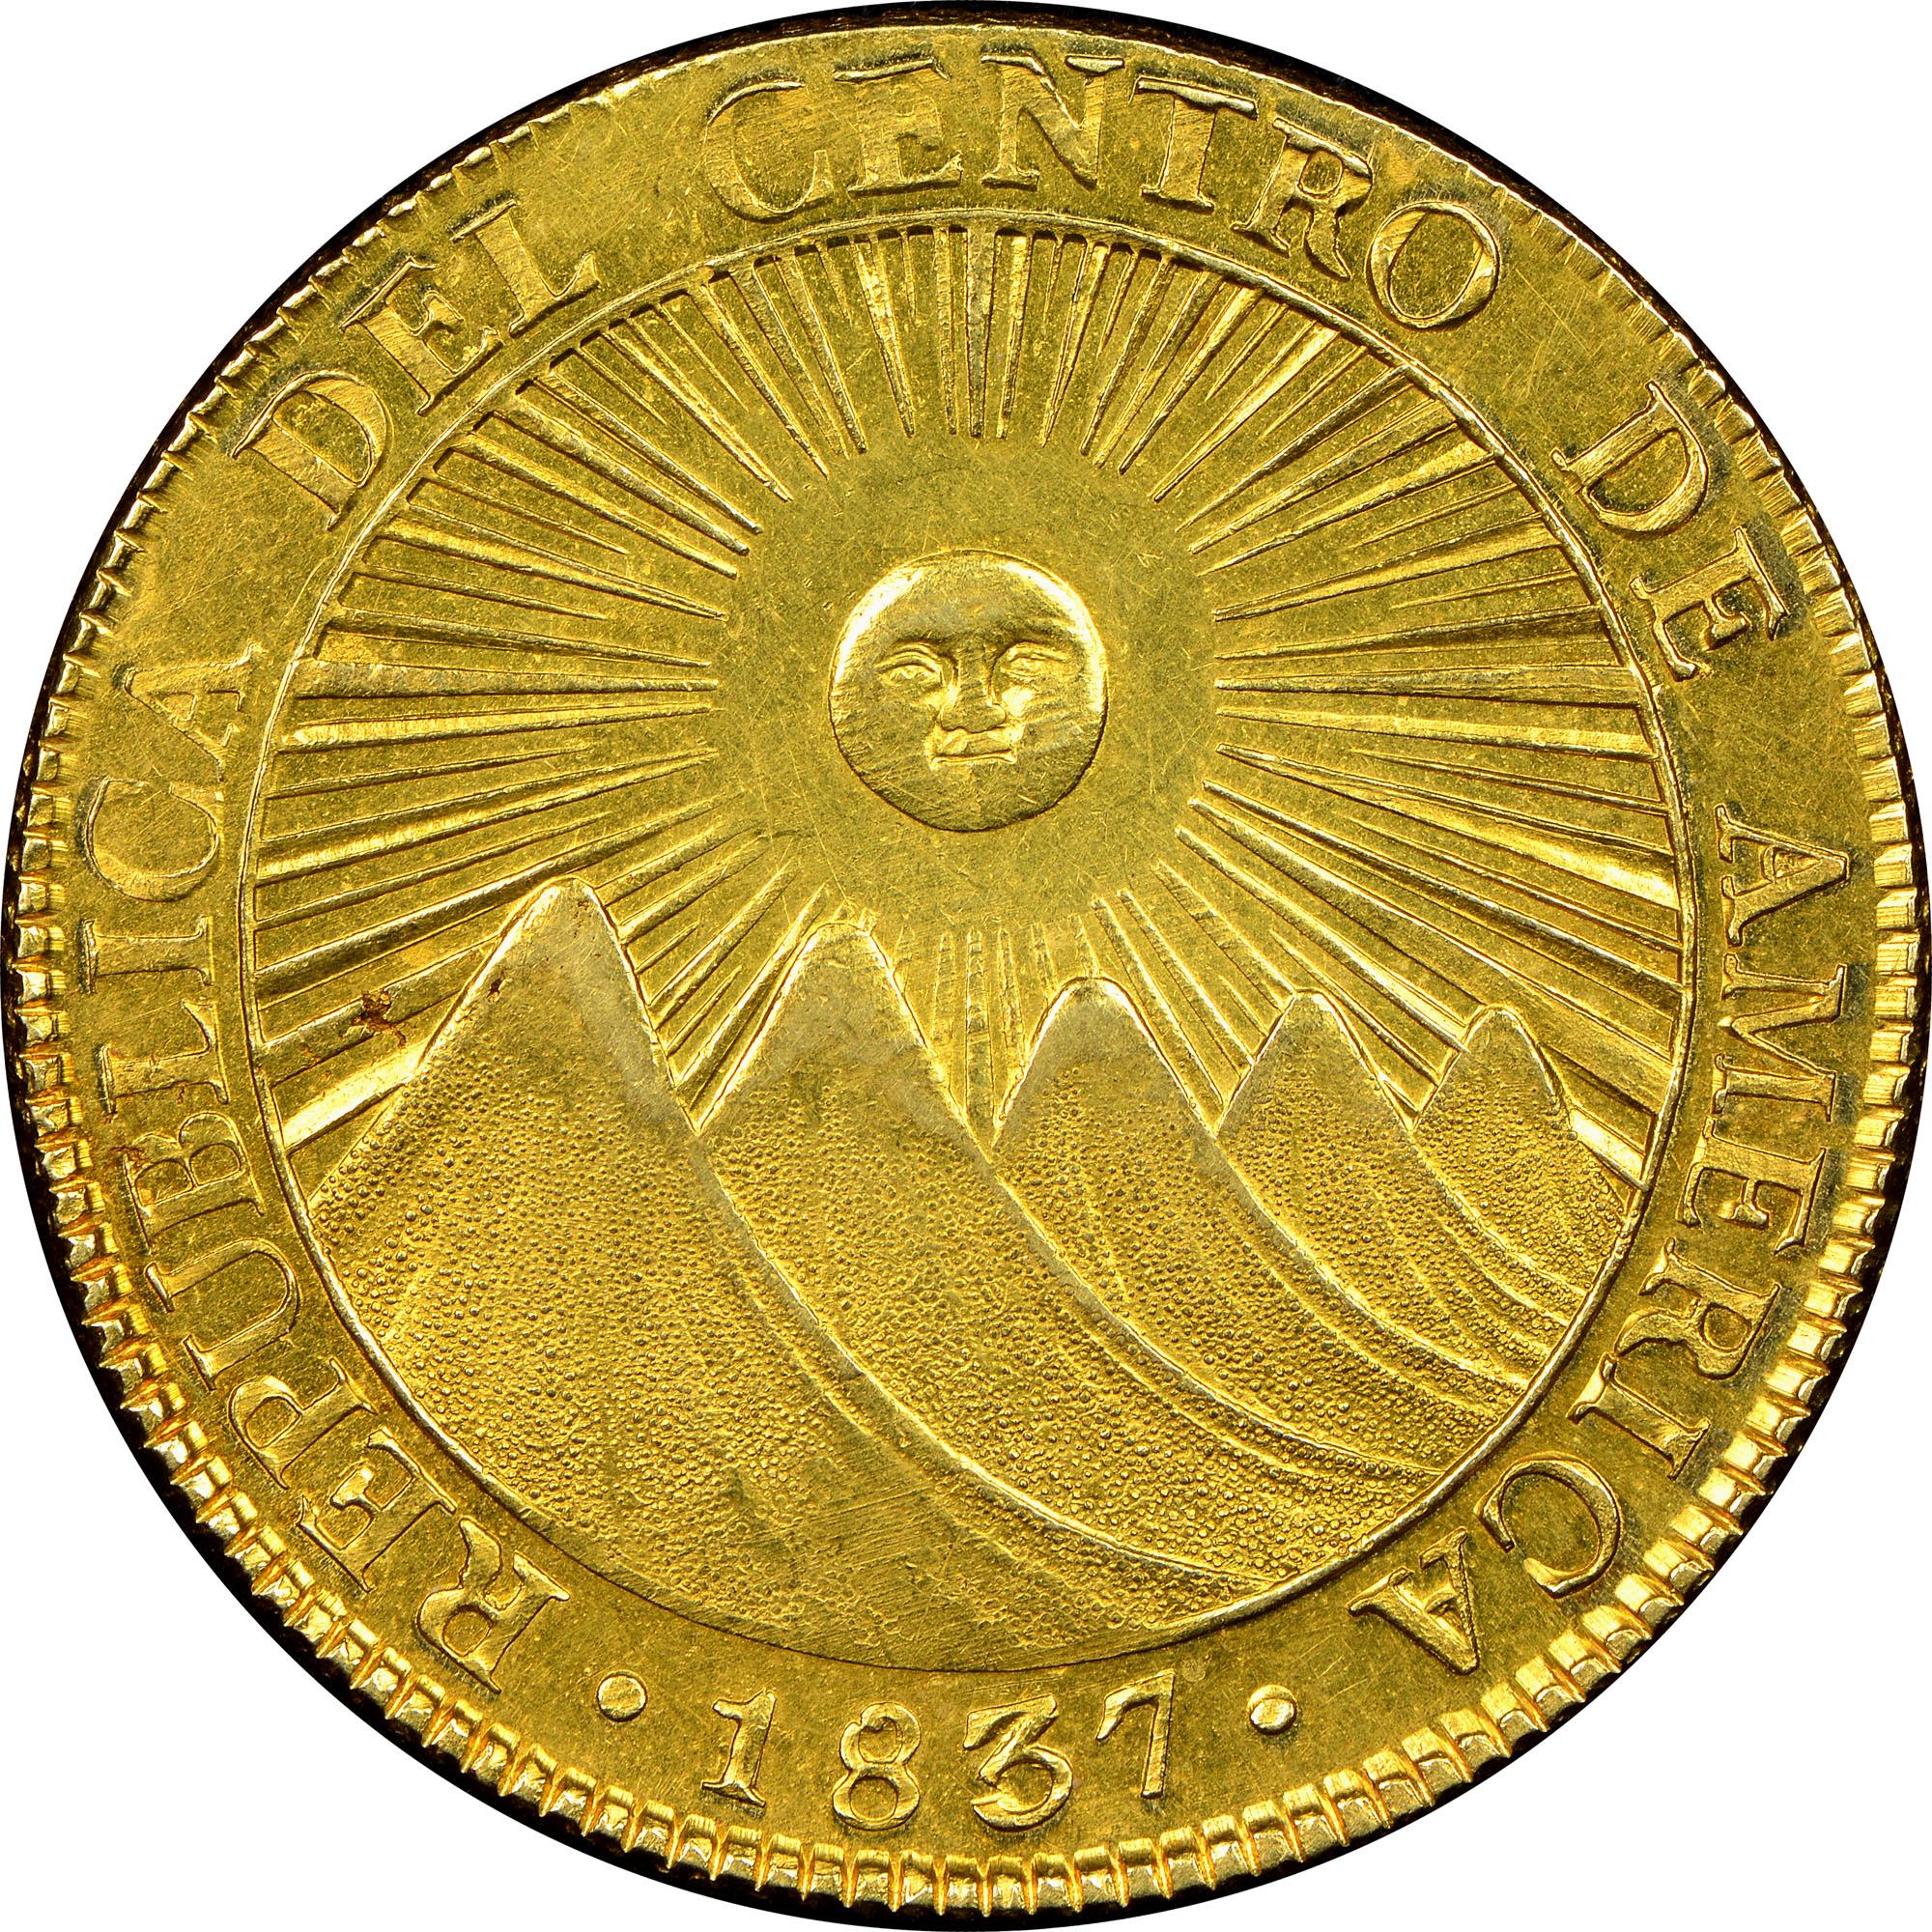 1828-1837 Central American Republic 8 Escudos obverse